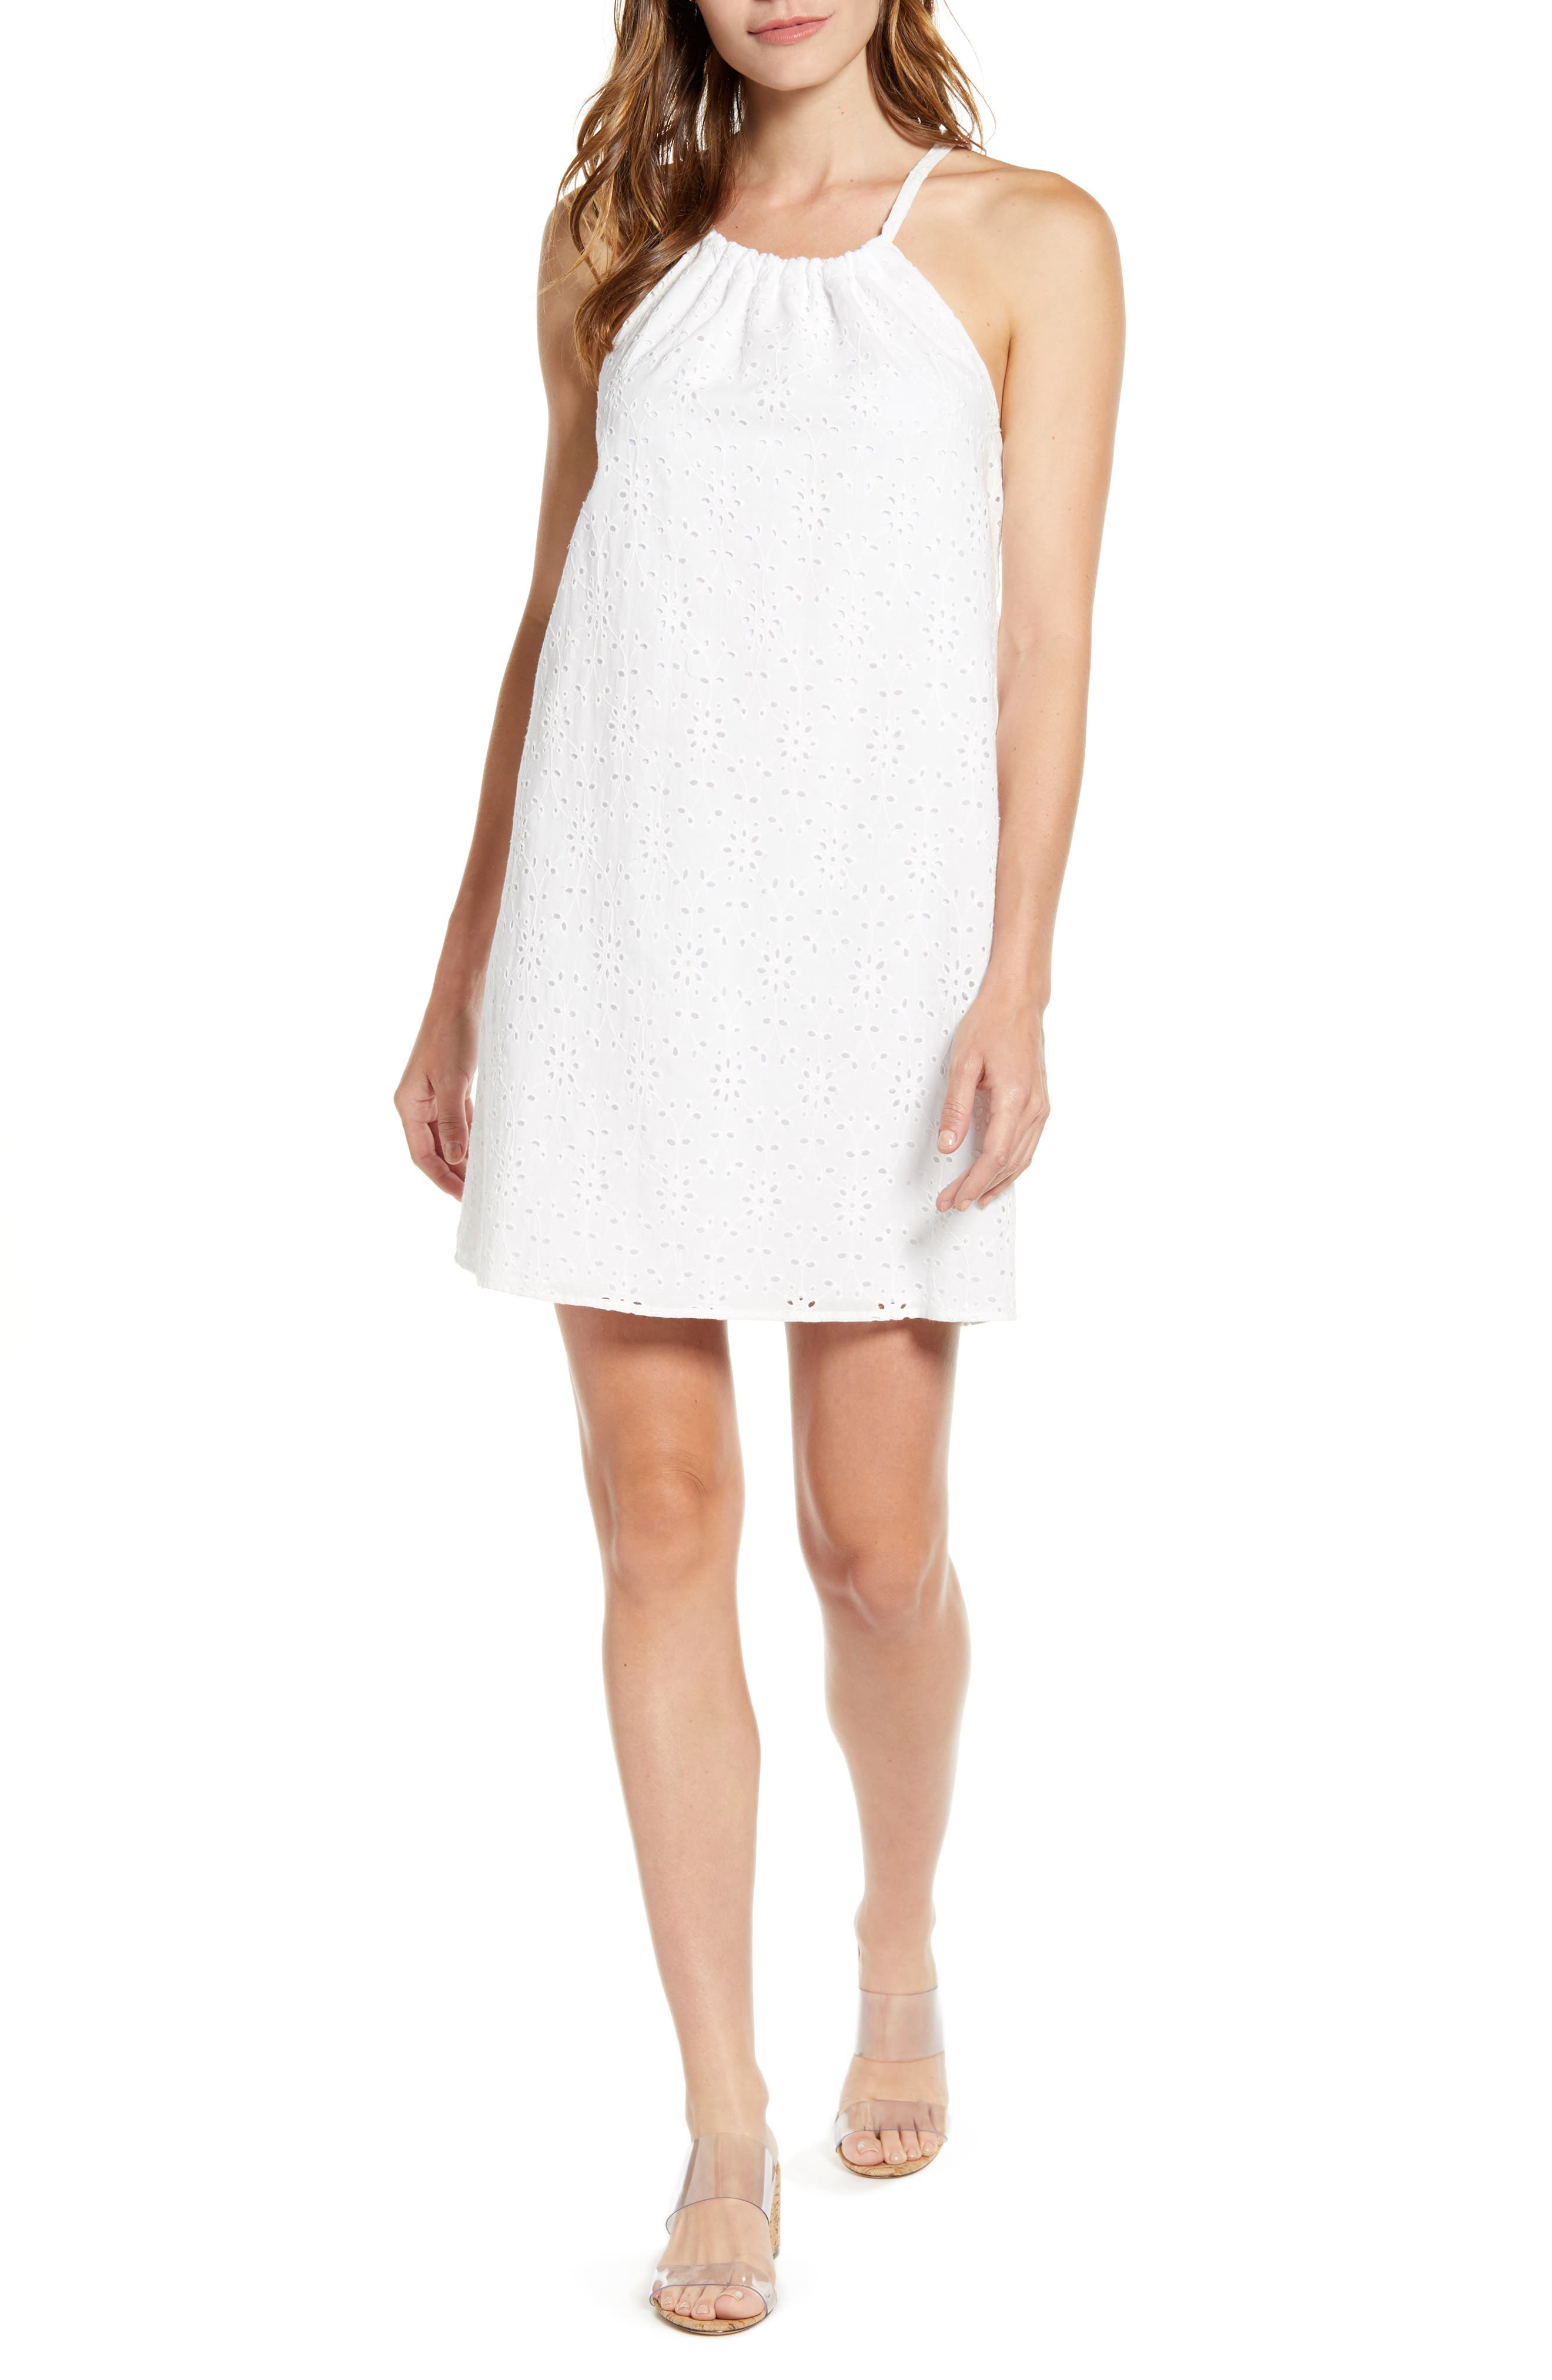 Gibson X Hot Summer Nights Two Peas Eyelet Halter Summer Dress, White (Regular & Petite) (Nordstrom Exclusive)